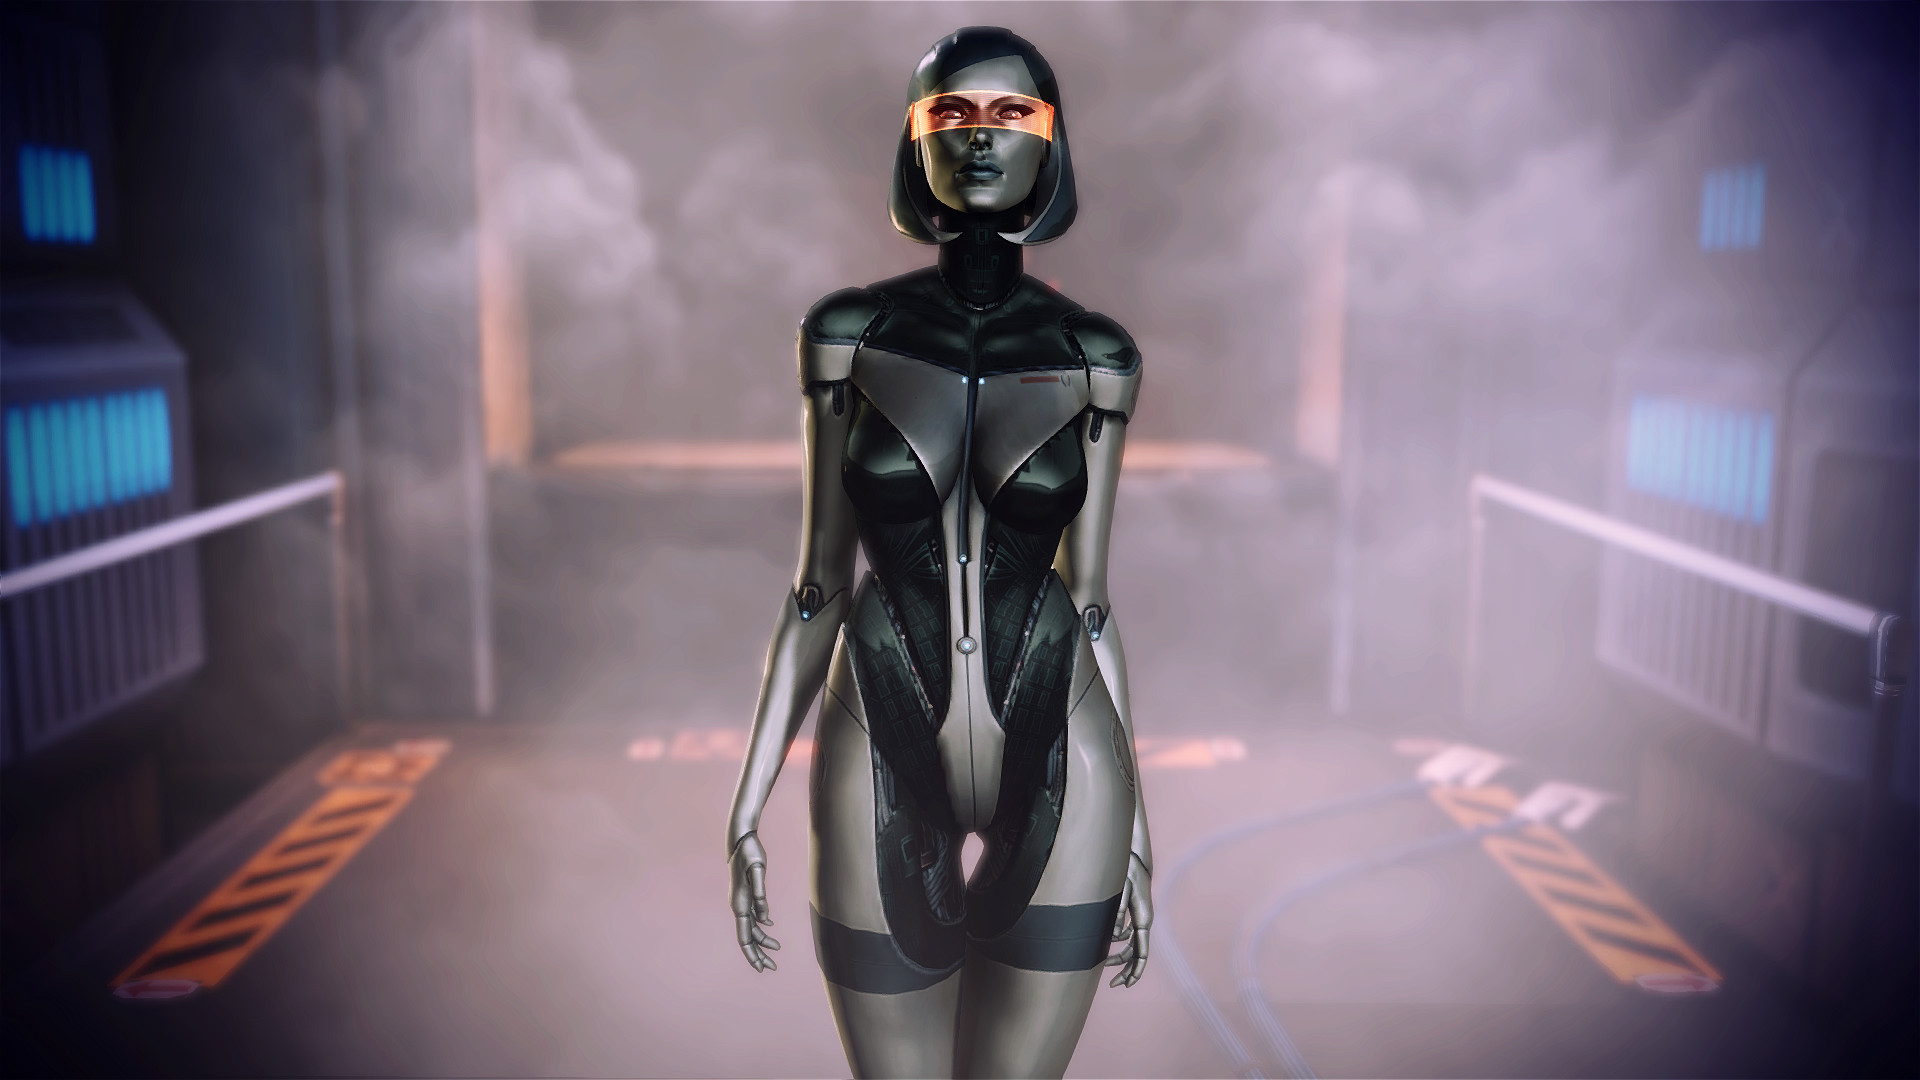 44+] EDI Mass Effect Wallpaper on WallpaperSafari